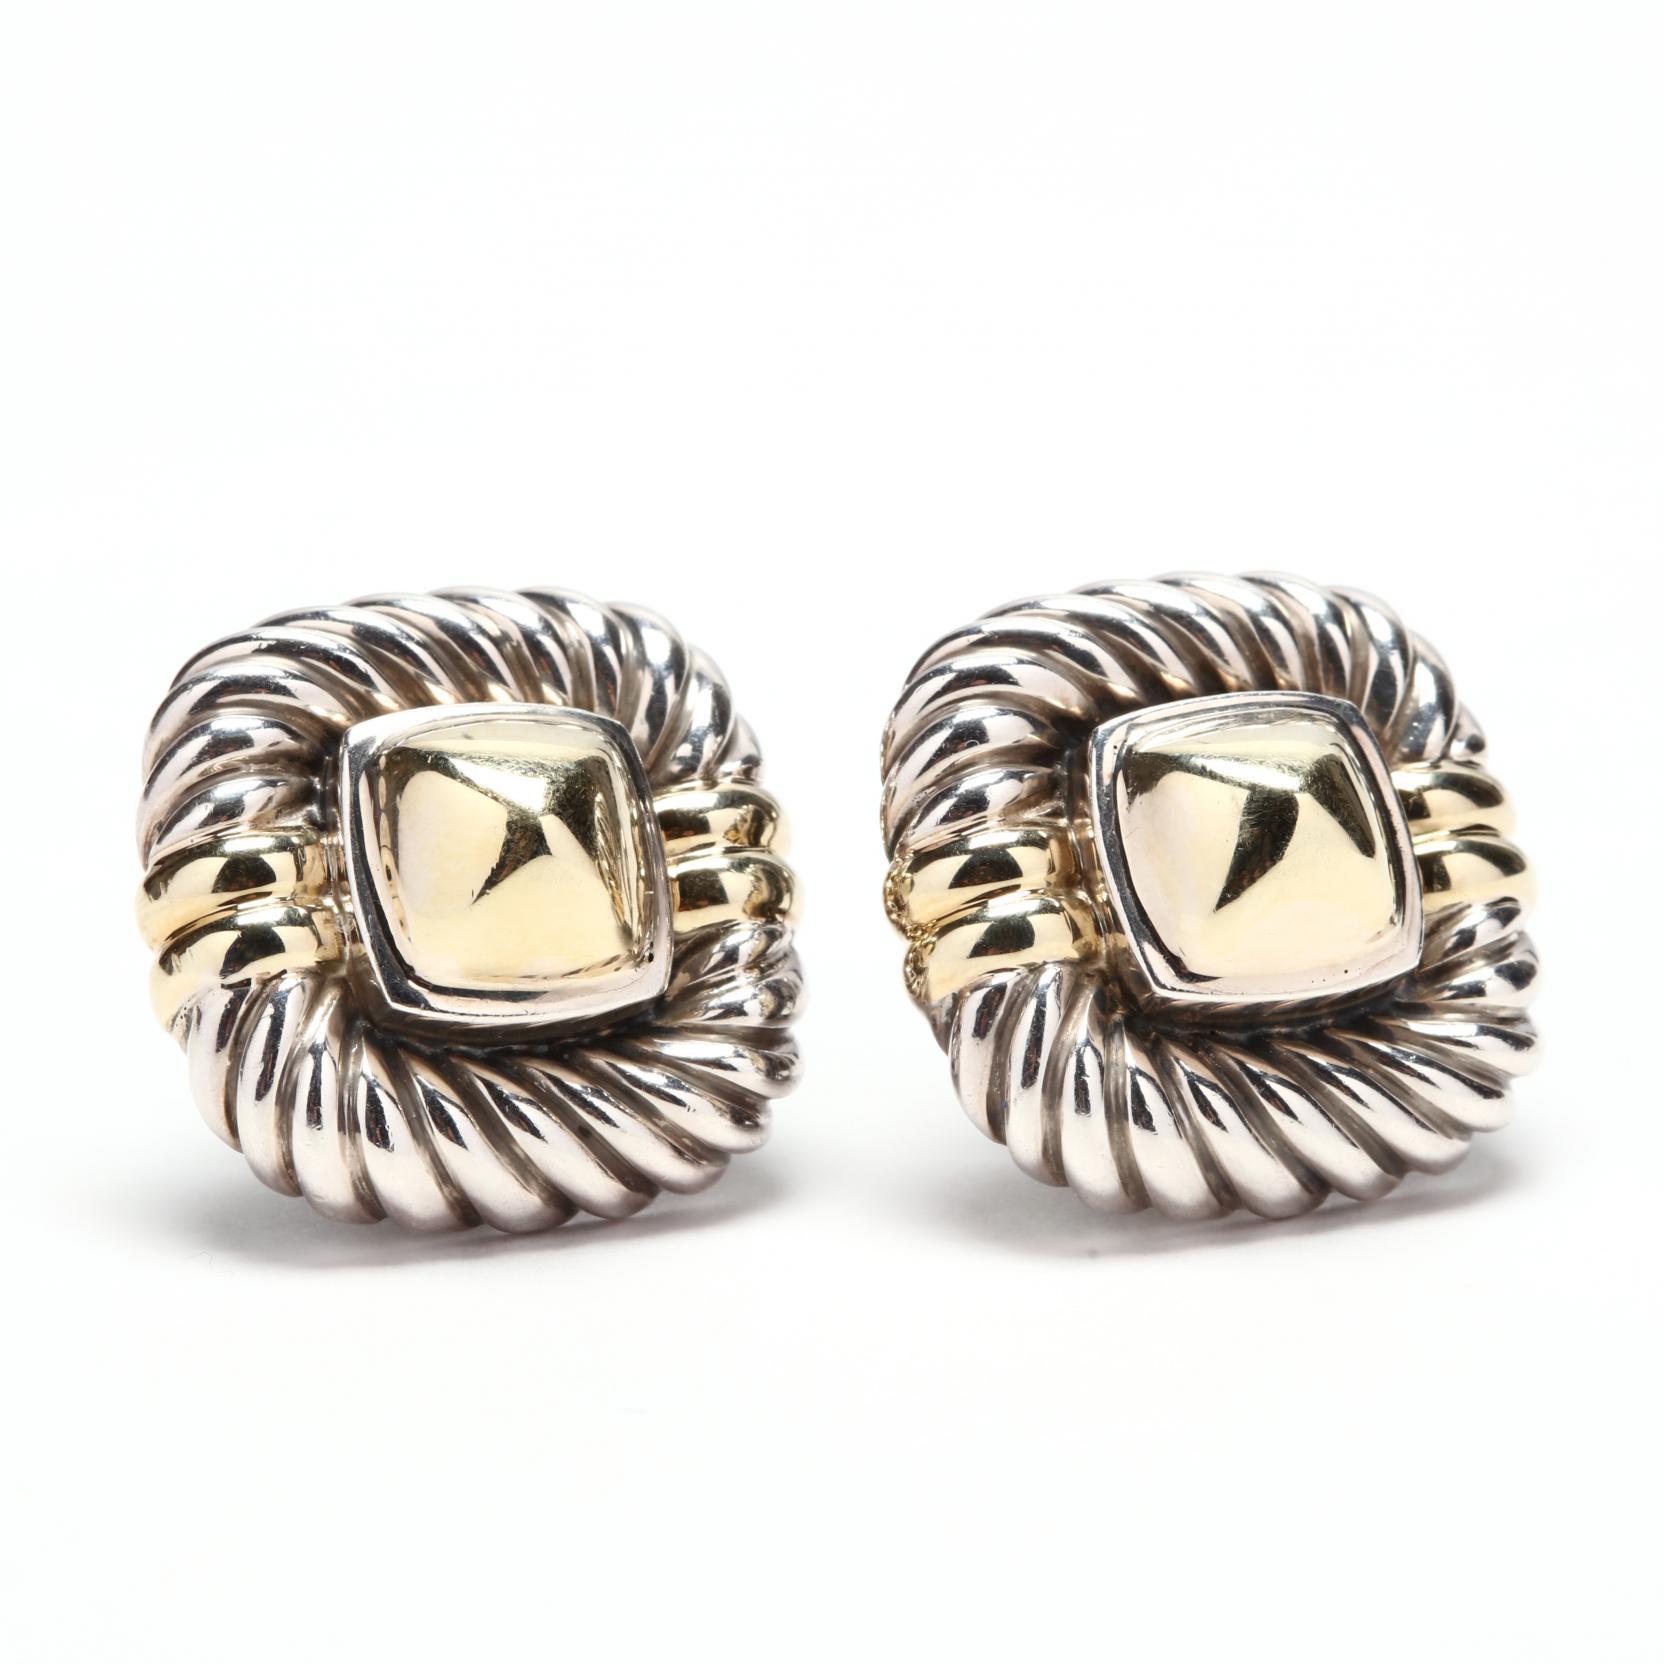 sterling-silver-and-14kt-gold-earrings-david-yurman